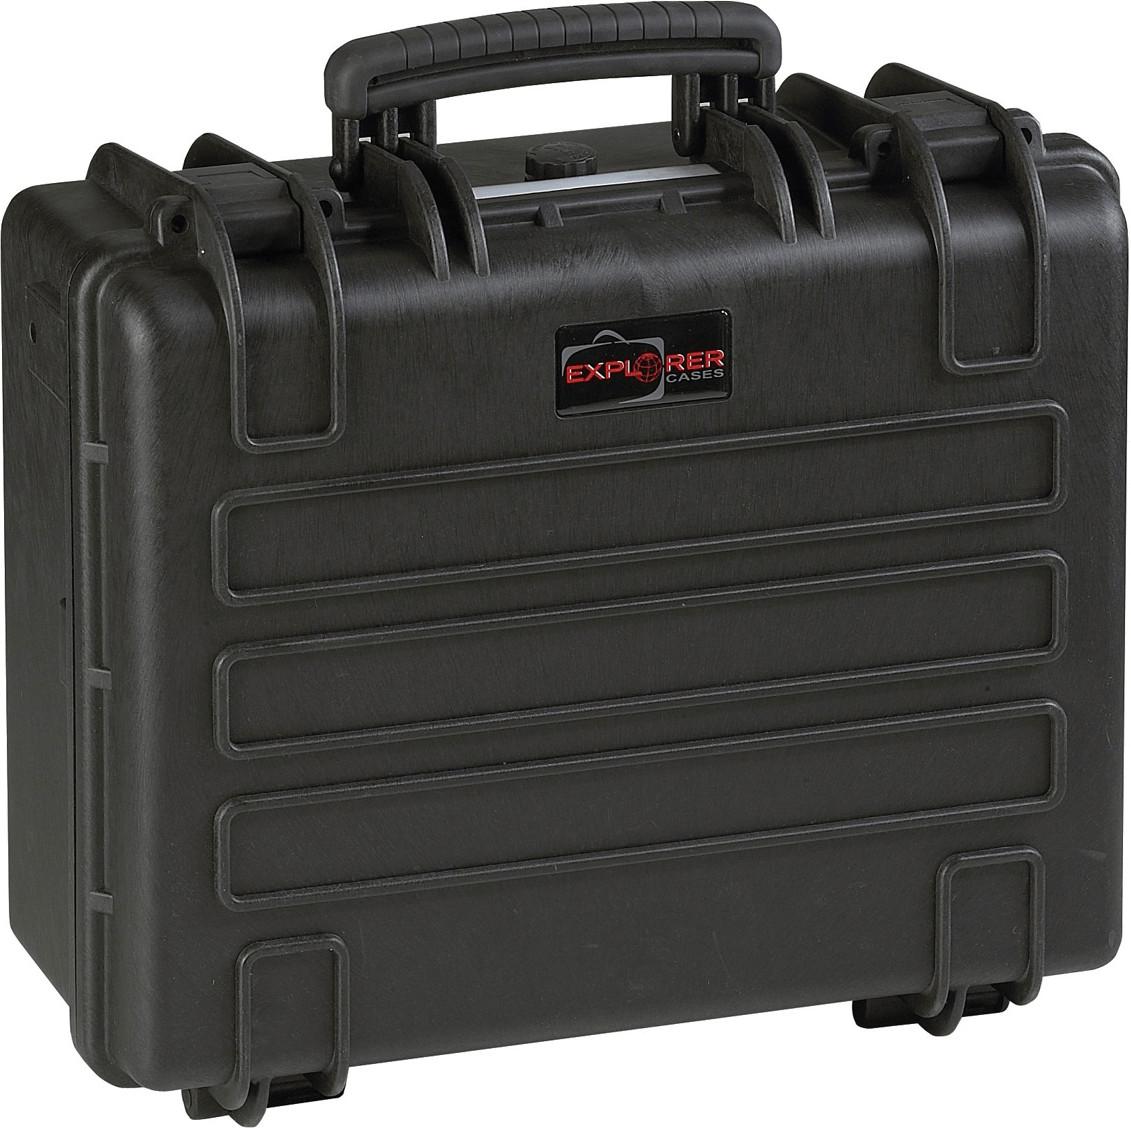 Image of Explorer Cases 4419